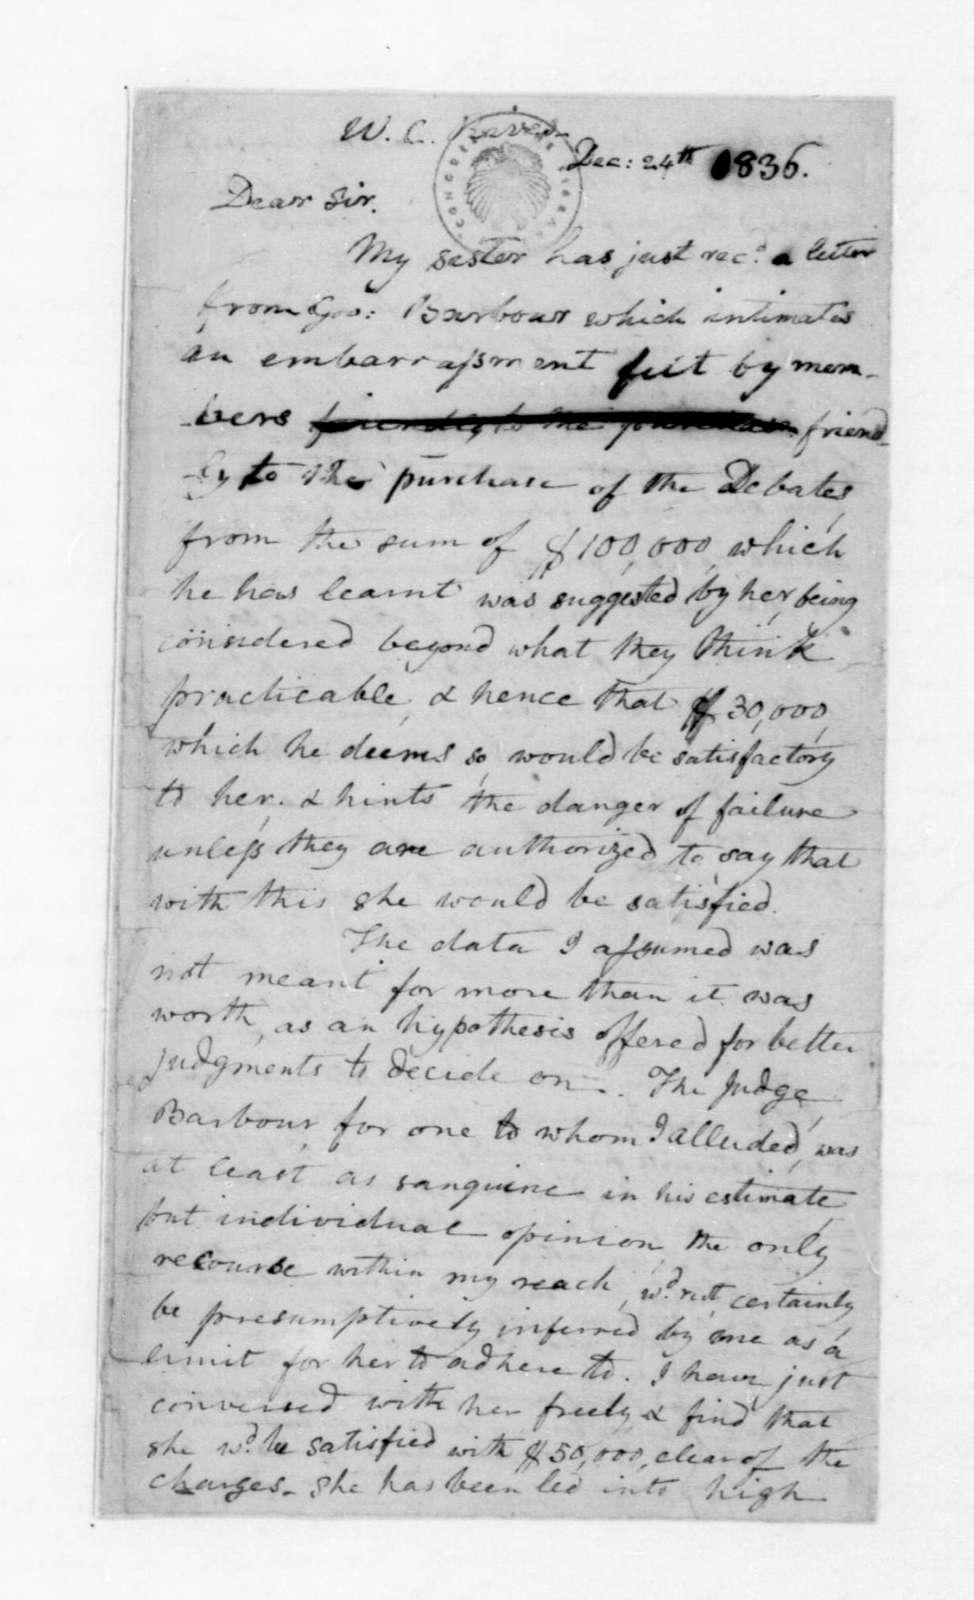 John C. Payne to William C. Rives, December 24, 1836.